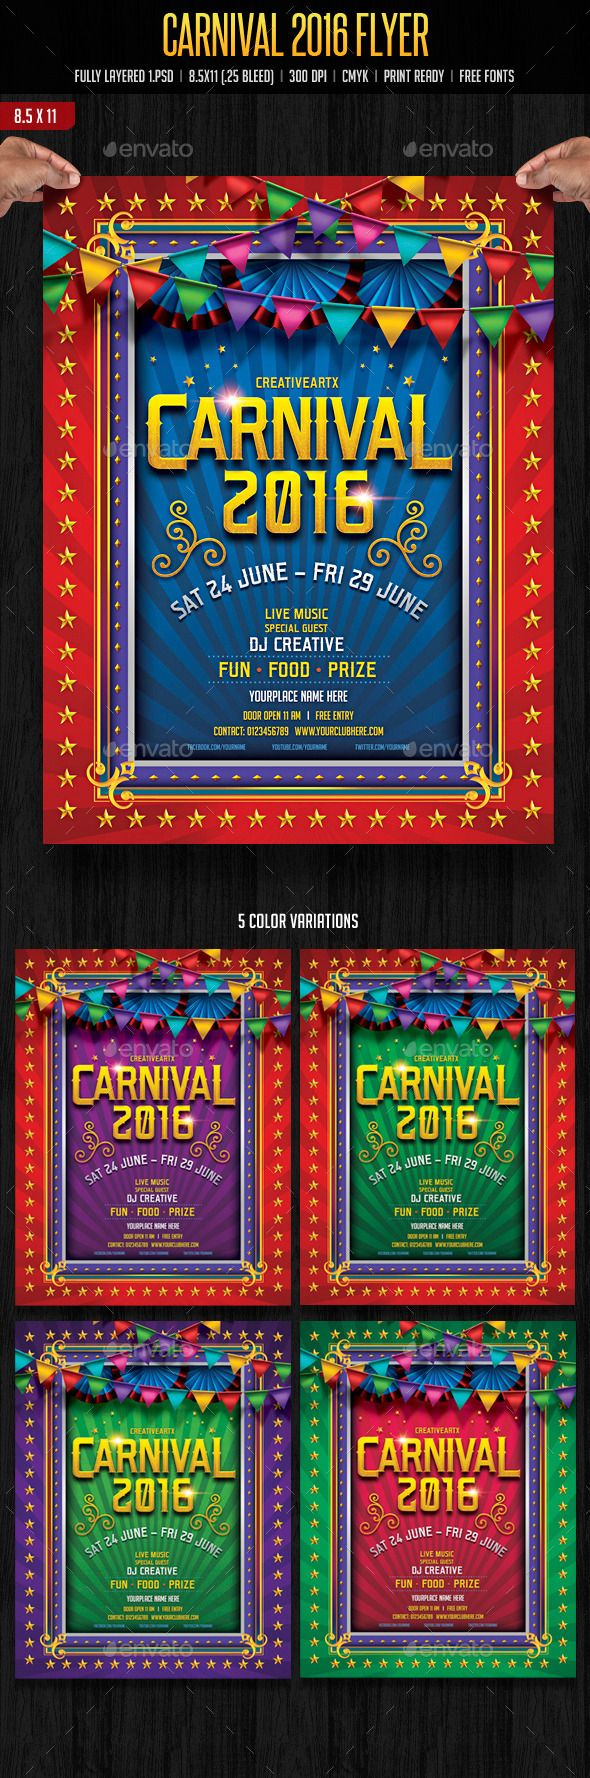 Carnival Flyer Flyer Carnival Flyer Template